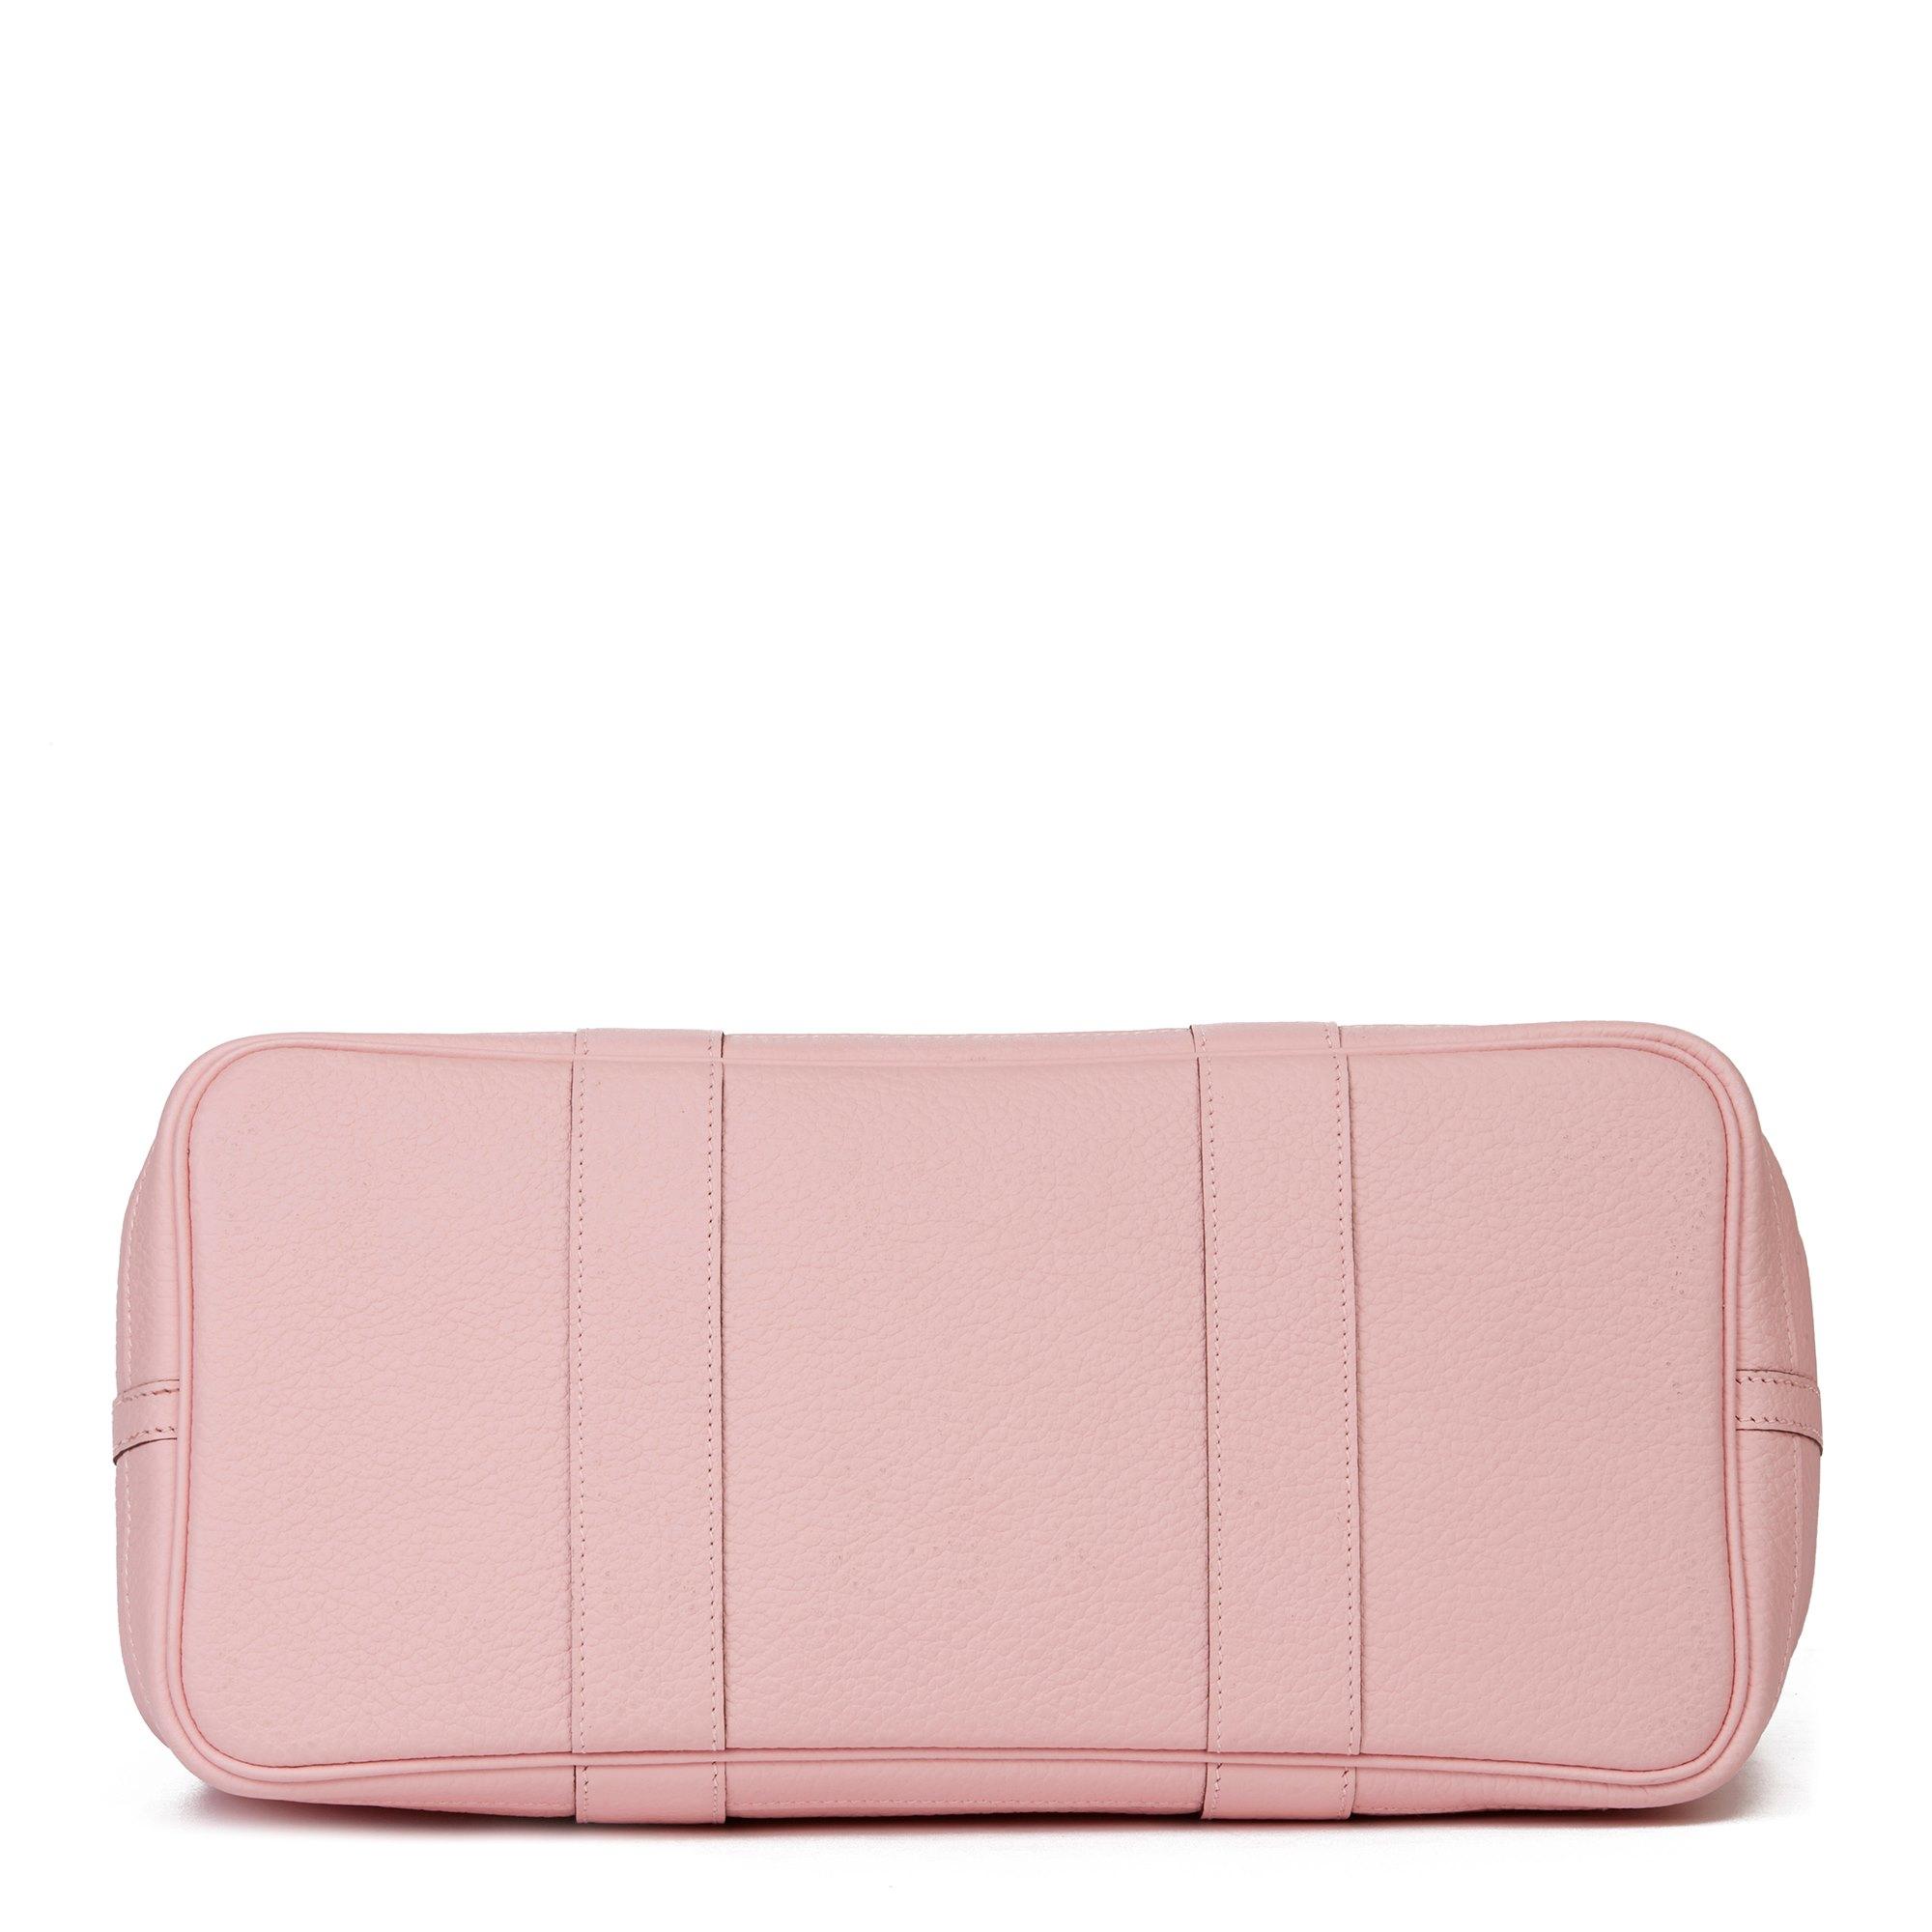 Hermès Rose Sakura Vache Country Leather Garden Party 36cm